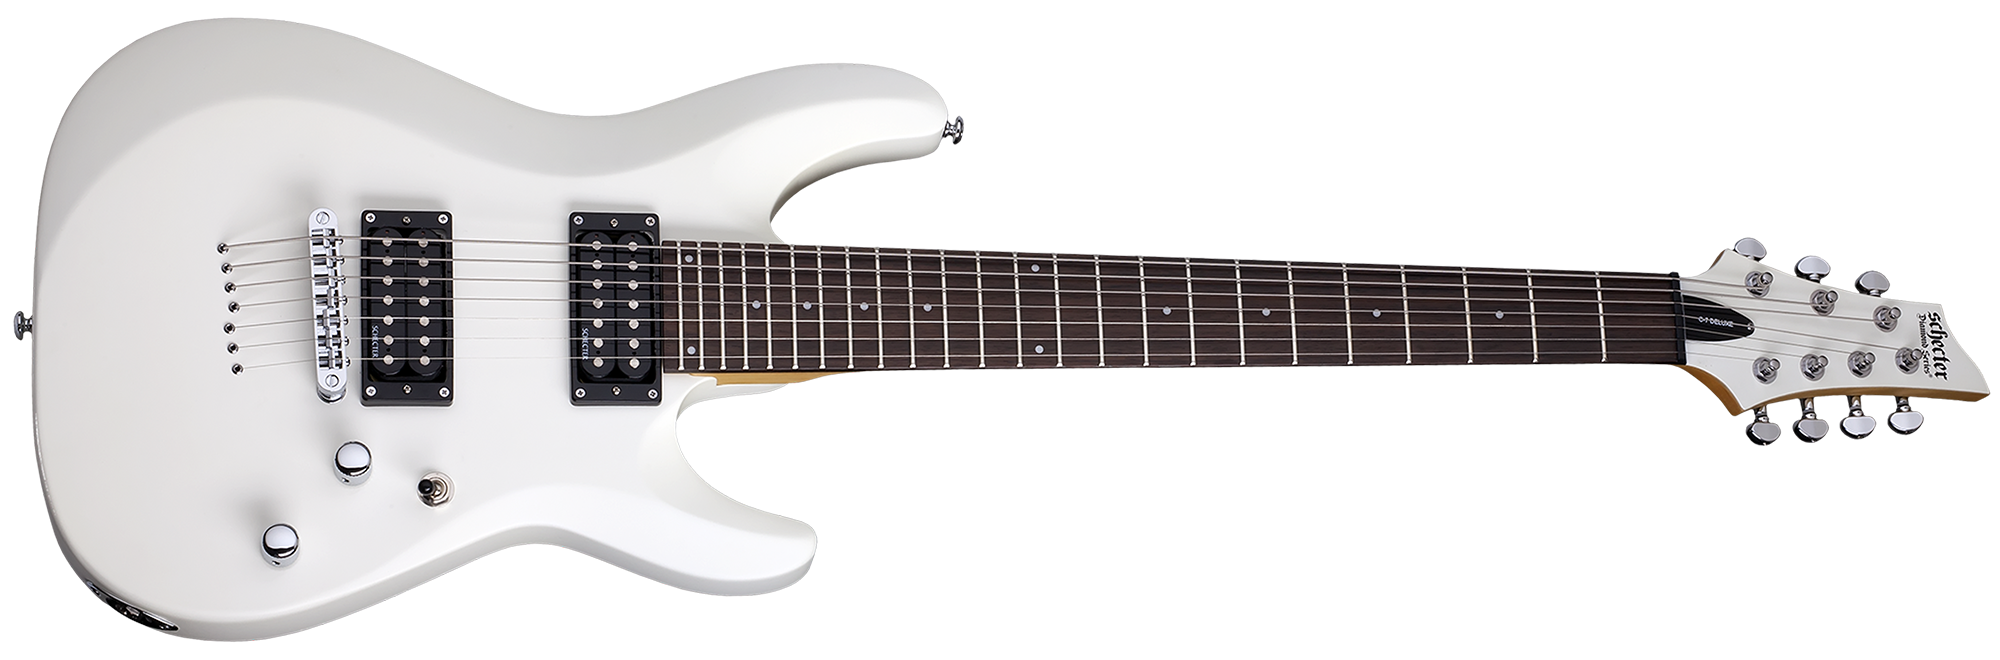 C-7 Deluxe Satin White (SWHT) SKU #438